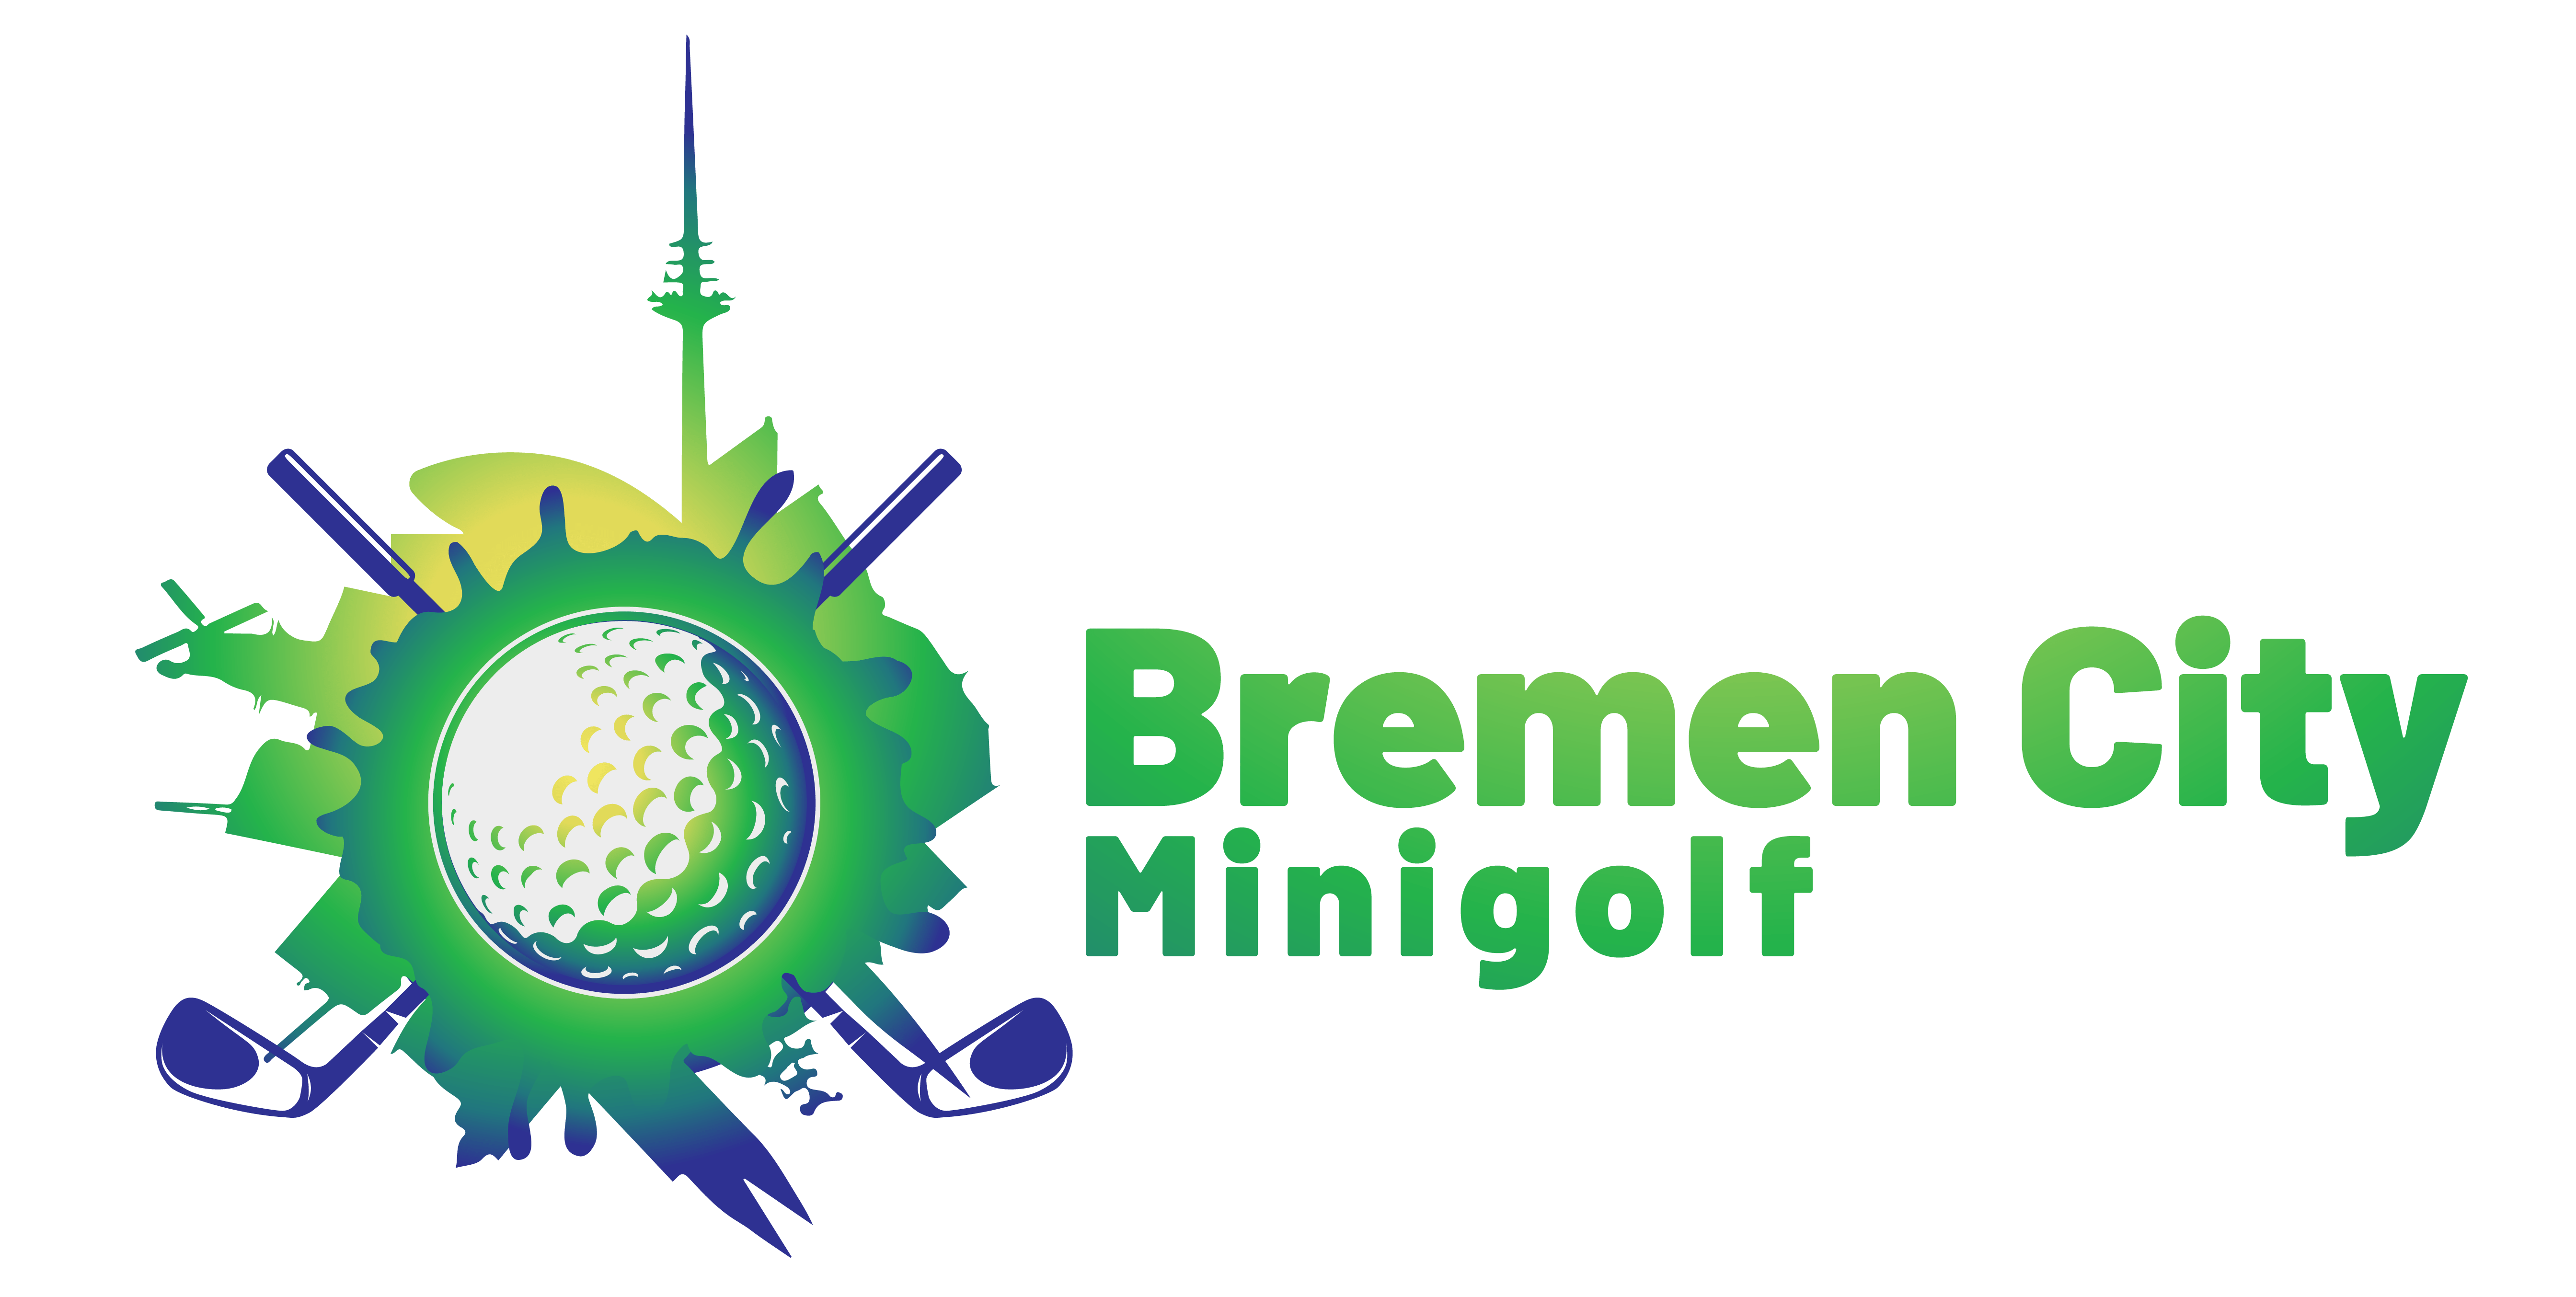 Bremen City Minigolf